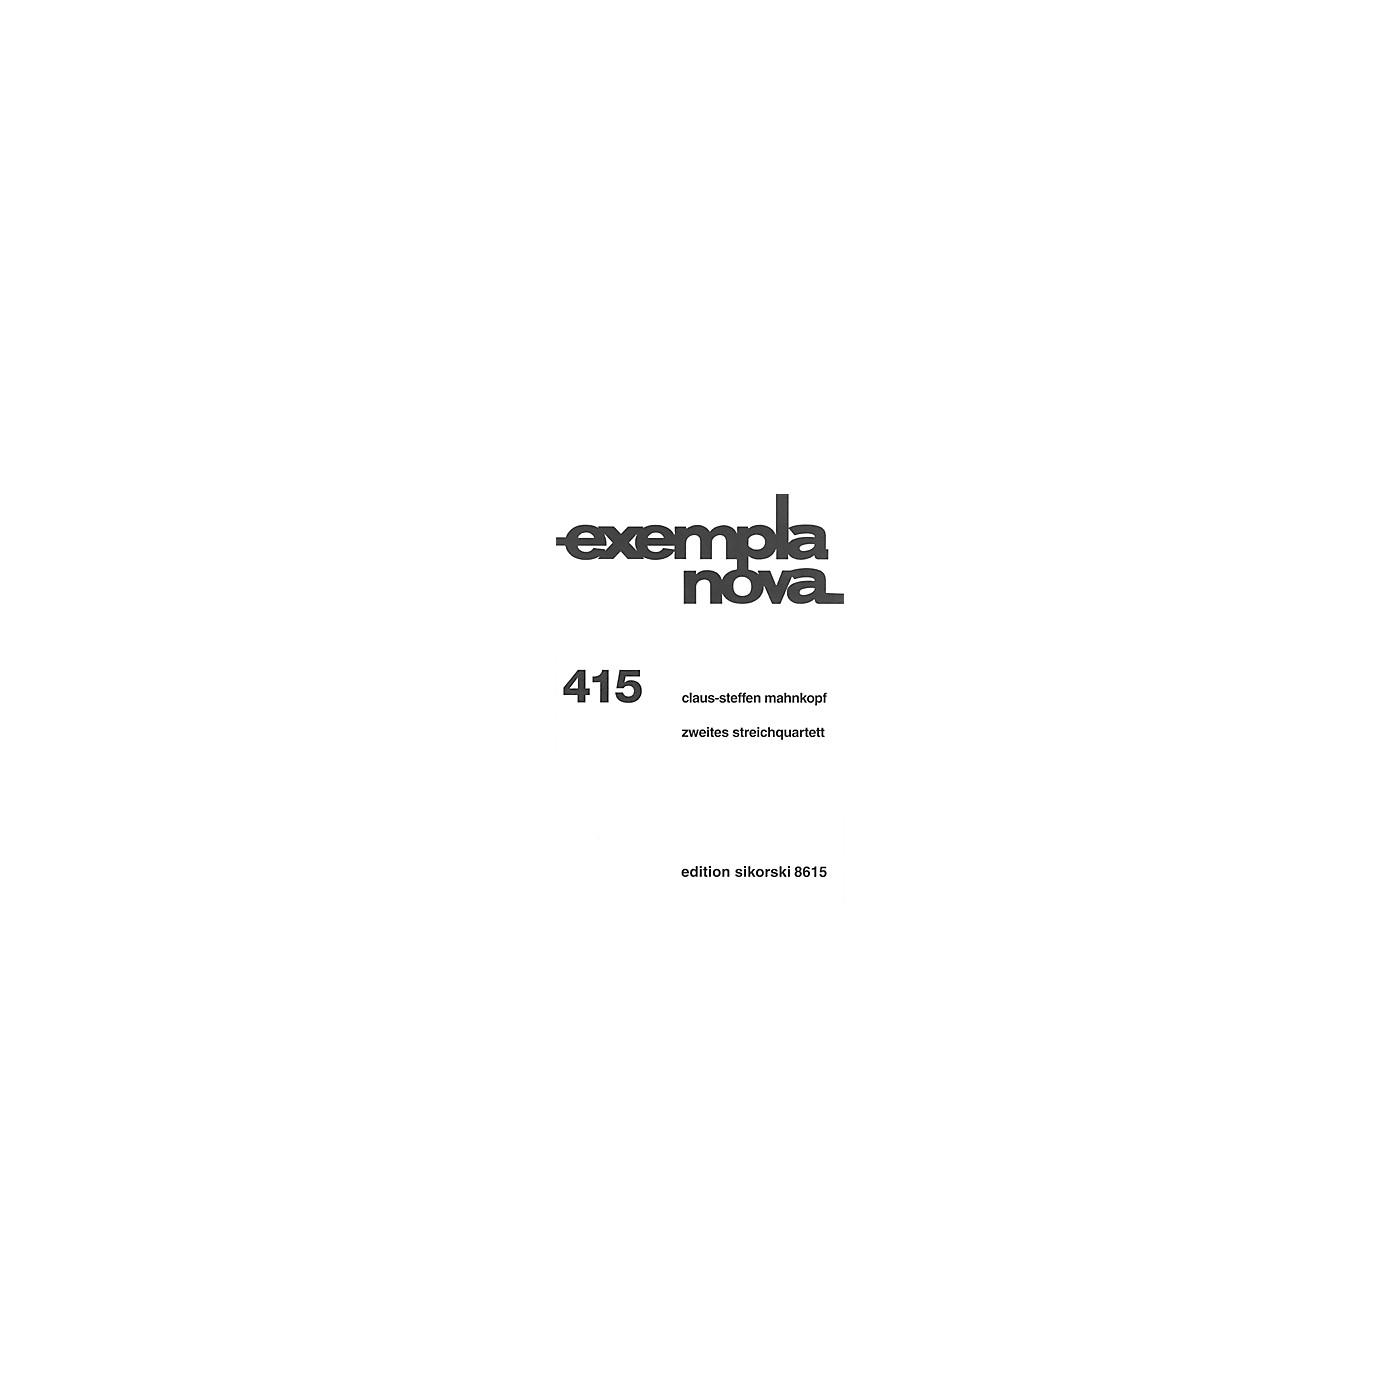 Sikorski String Quartet No. 2 (Zweites streichquartett) String Ensemble Series Softcover by Claus-Steffen Mahnkopf thumbnail